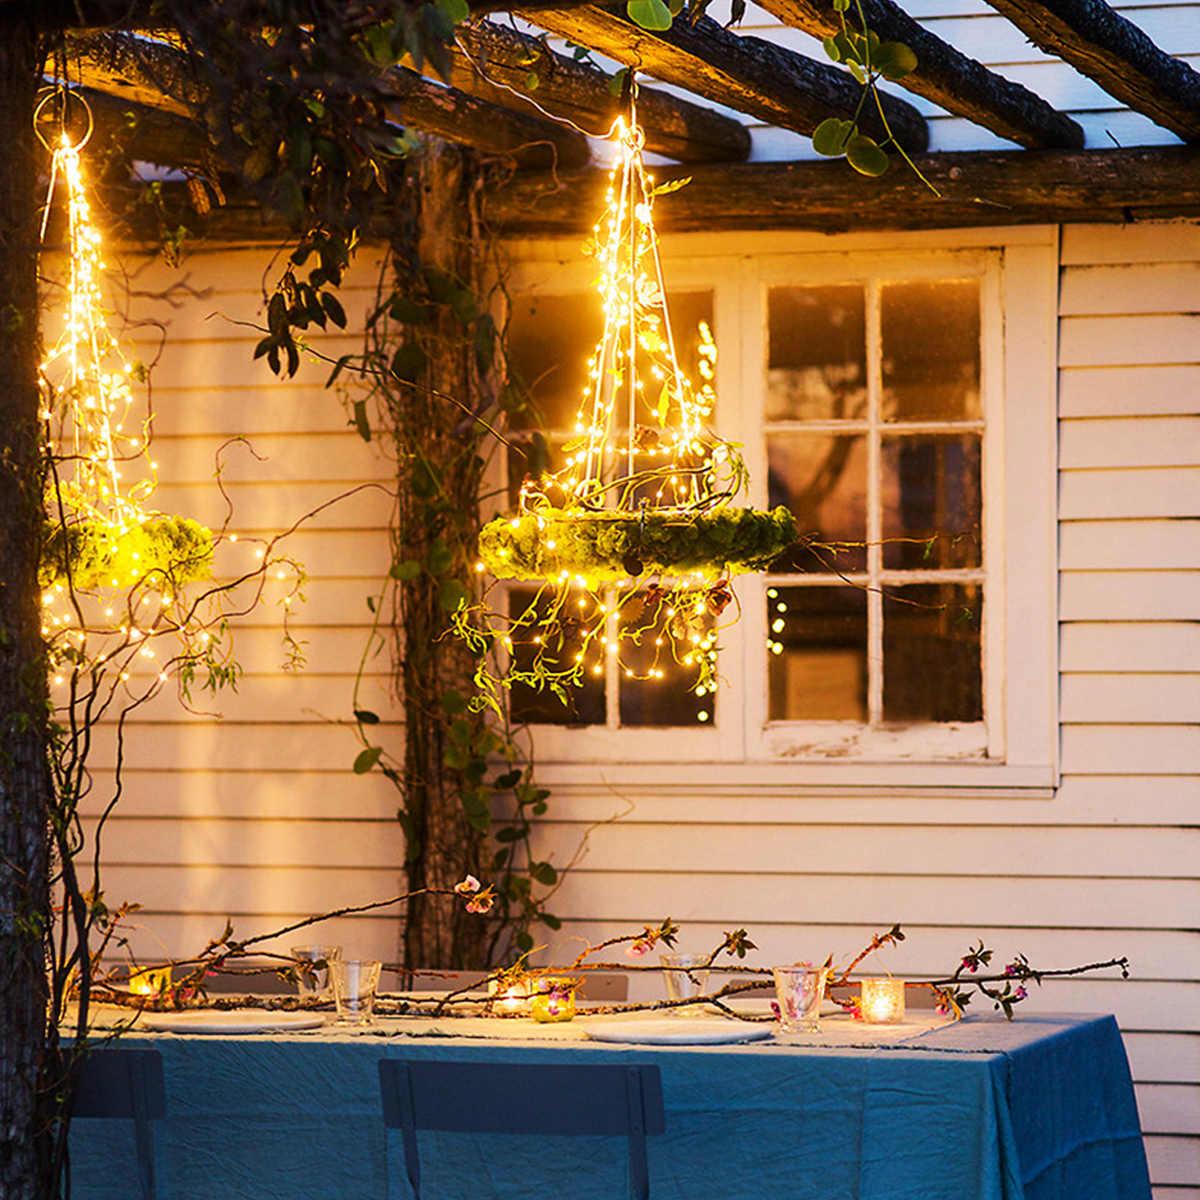 100/200LED سلسلة مصابيح تعمل بالطاقة الشمسية أضواء في الهواء الطلق مقاوم للماء أضواء ذات الأسلاك النحاسية لتزيين مهرجان الحديقة